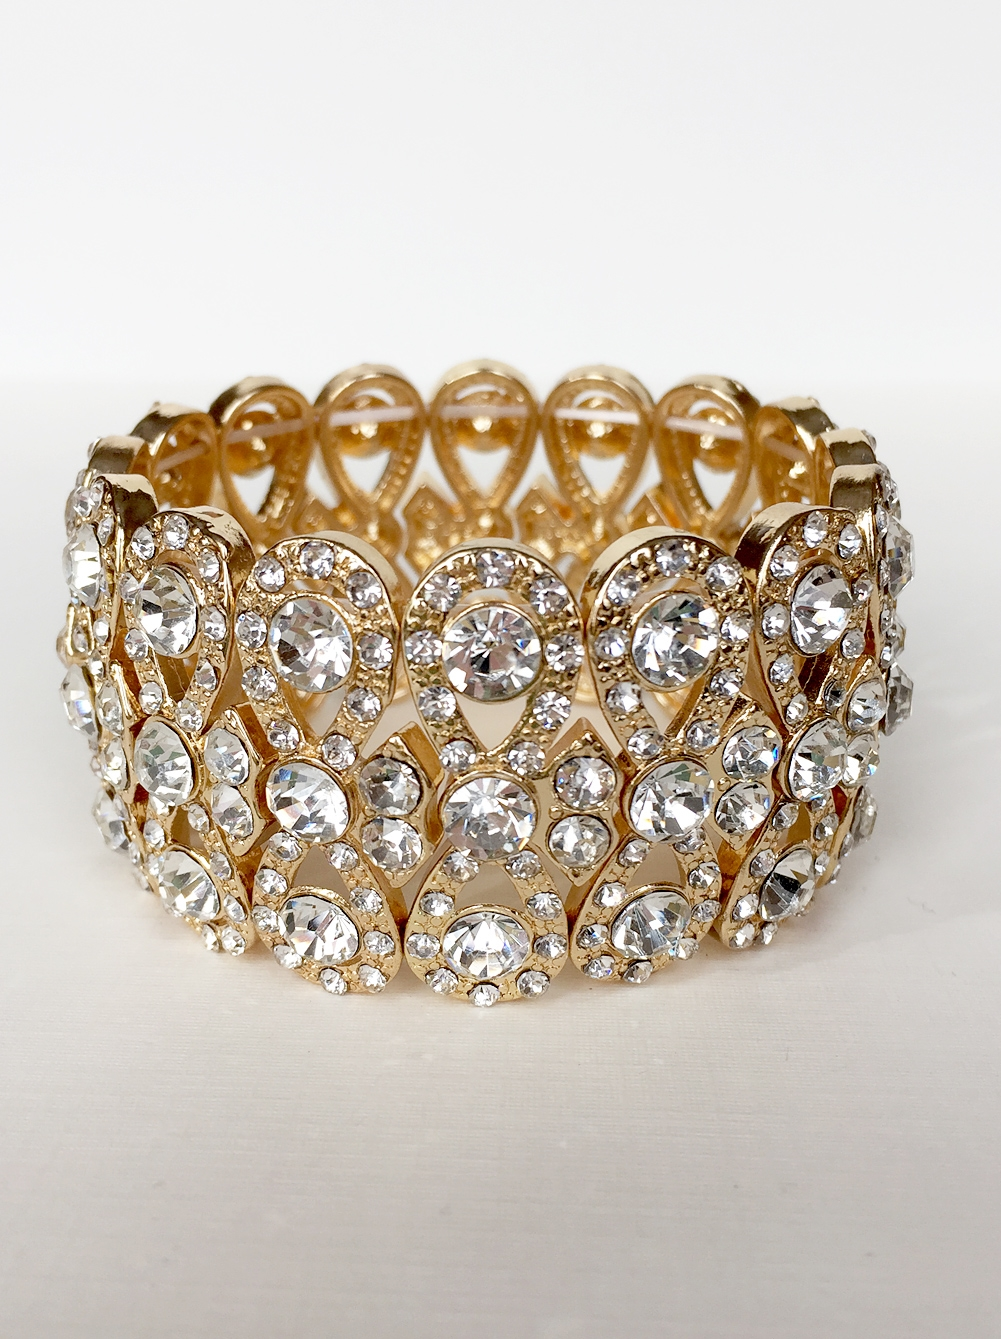 rhinestone bracelets isabelle gold rhinestone bracelet frtjthd